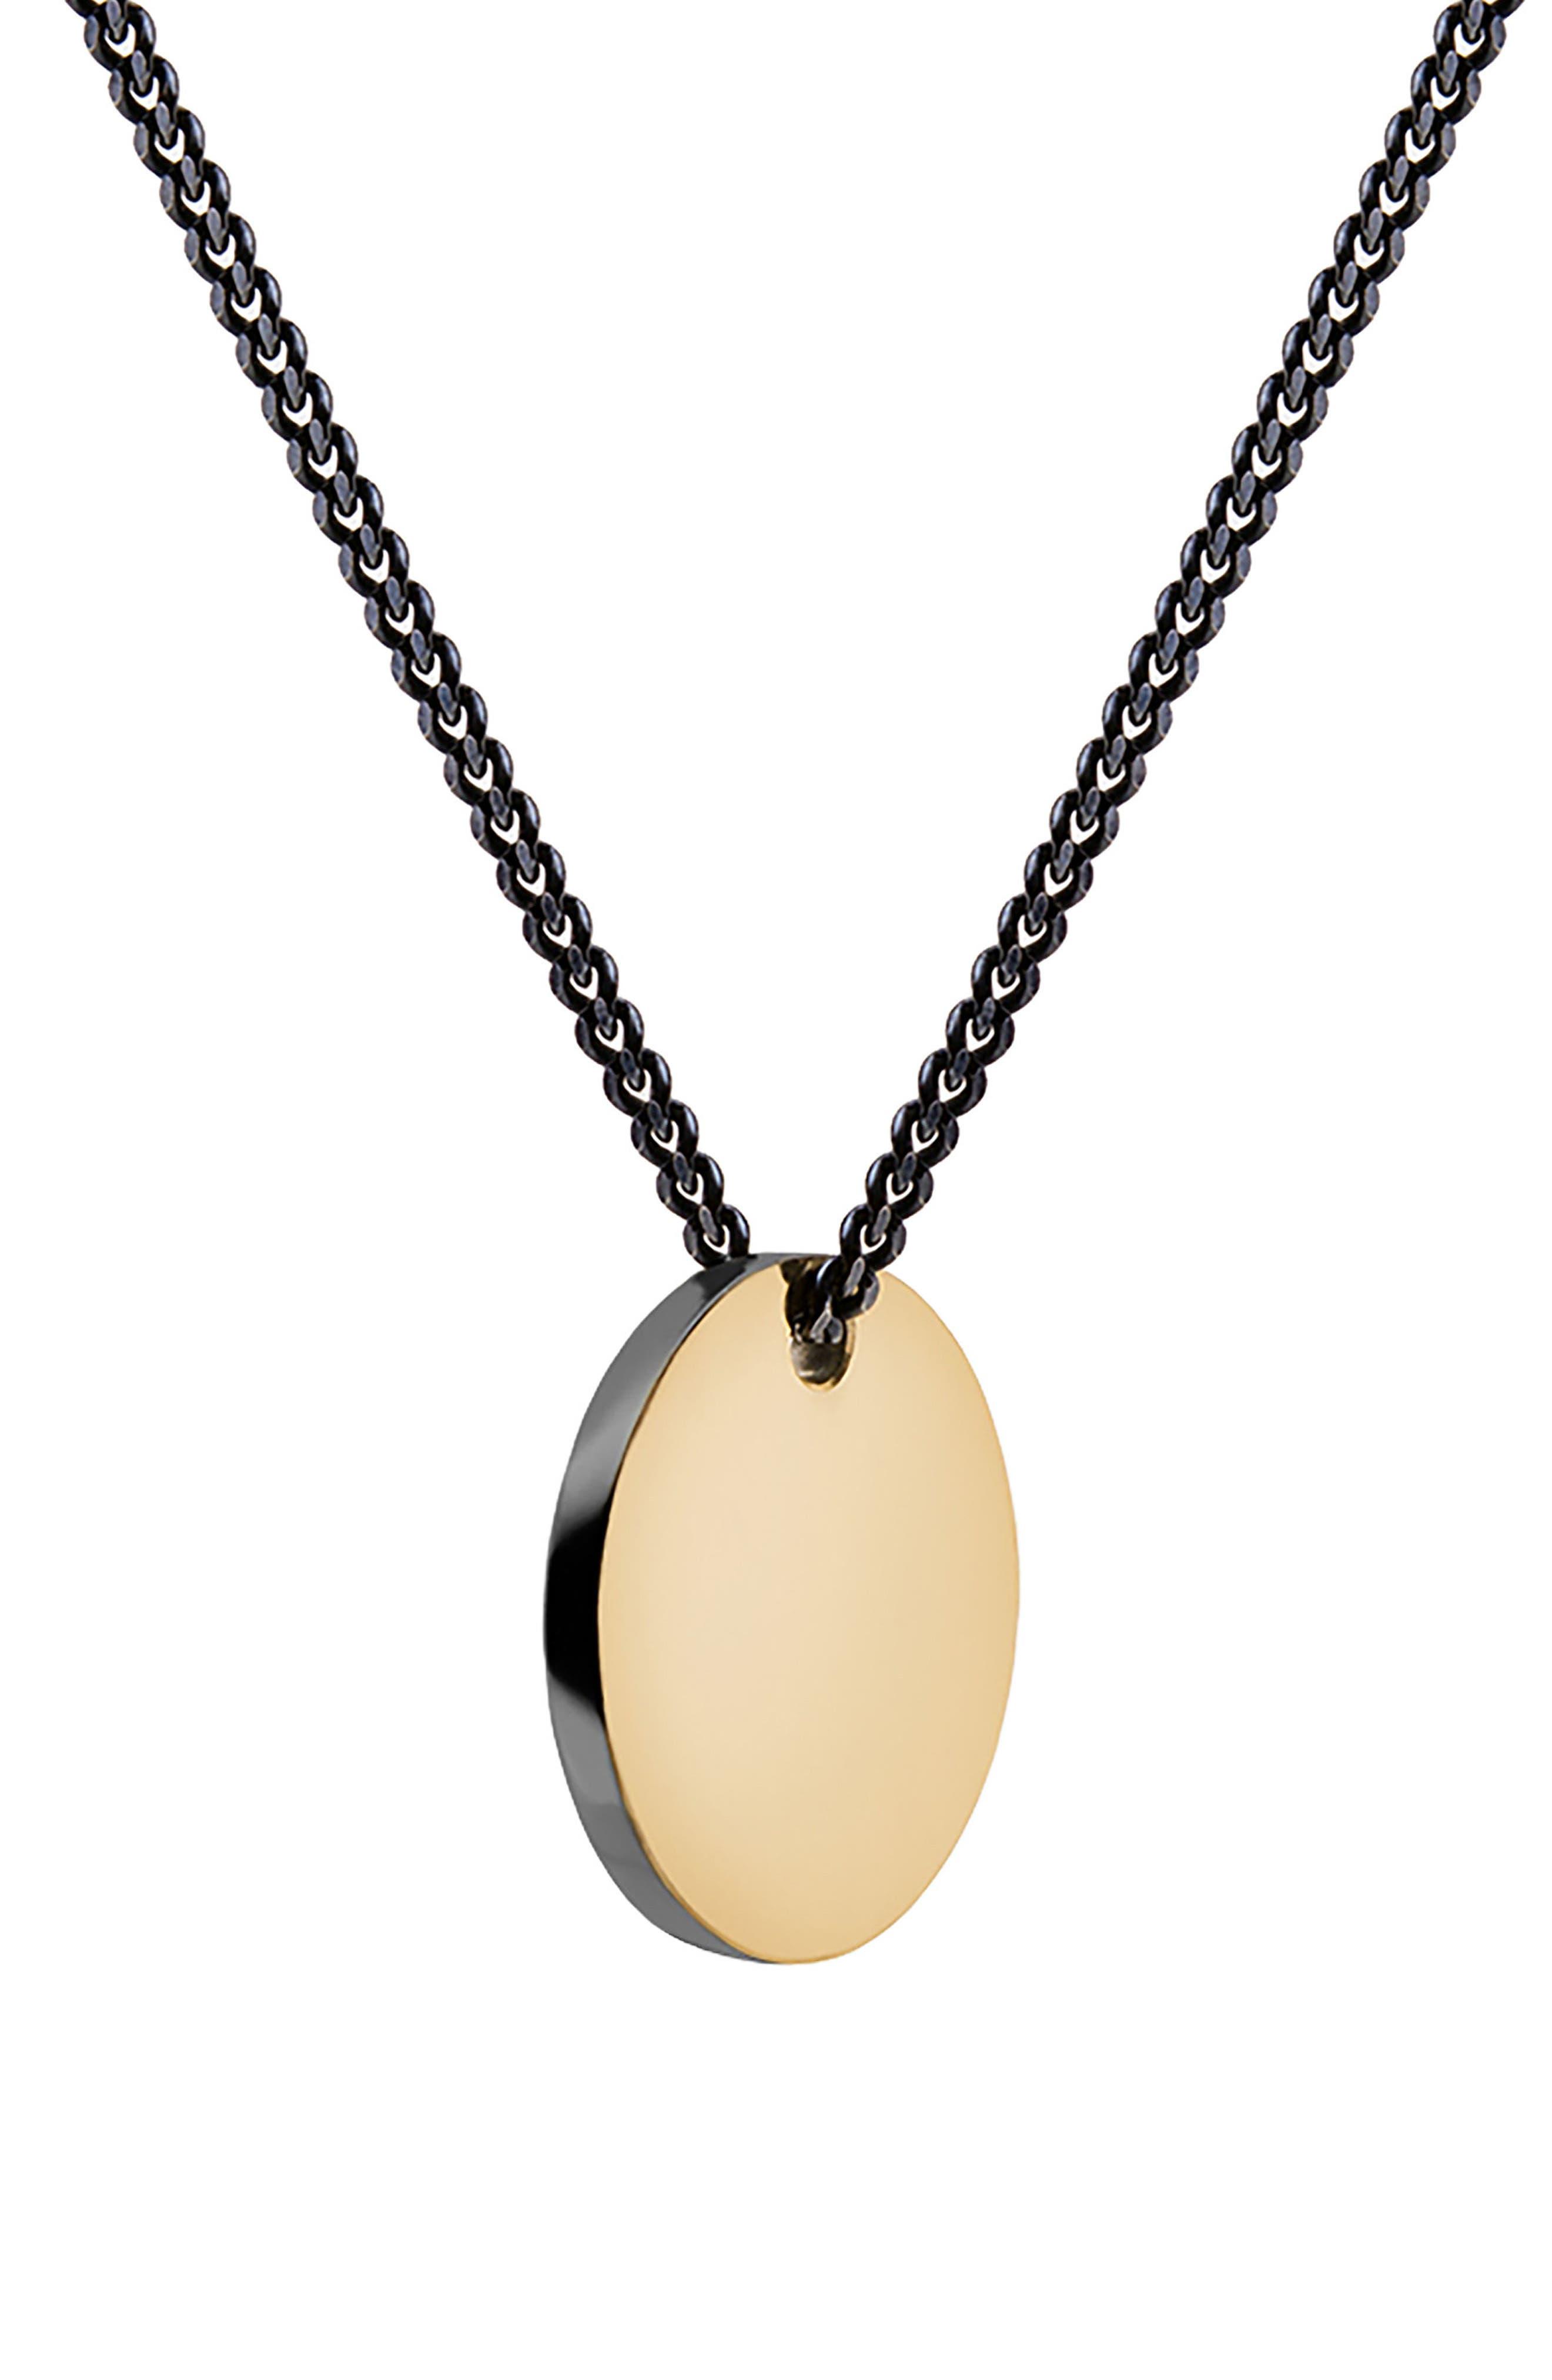 Fusion Pendant Necklace,                             Main thumbnail 1, color,                             Polished Gold/ Black